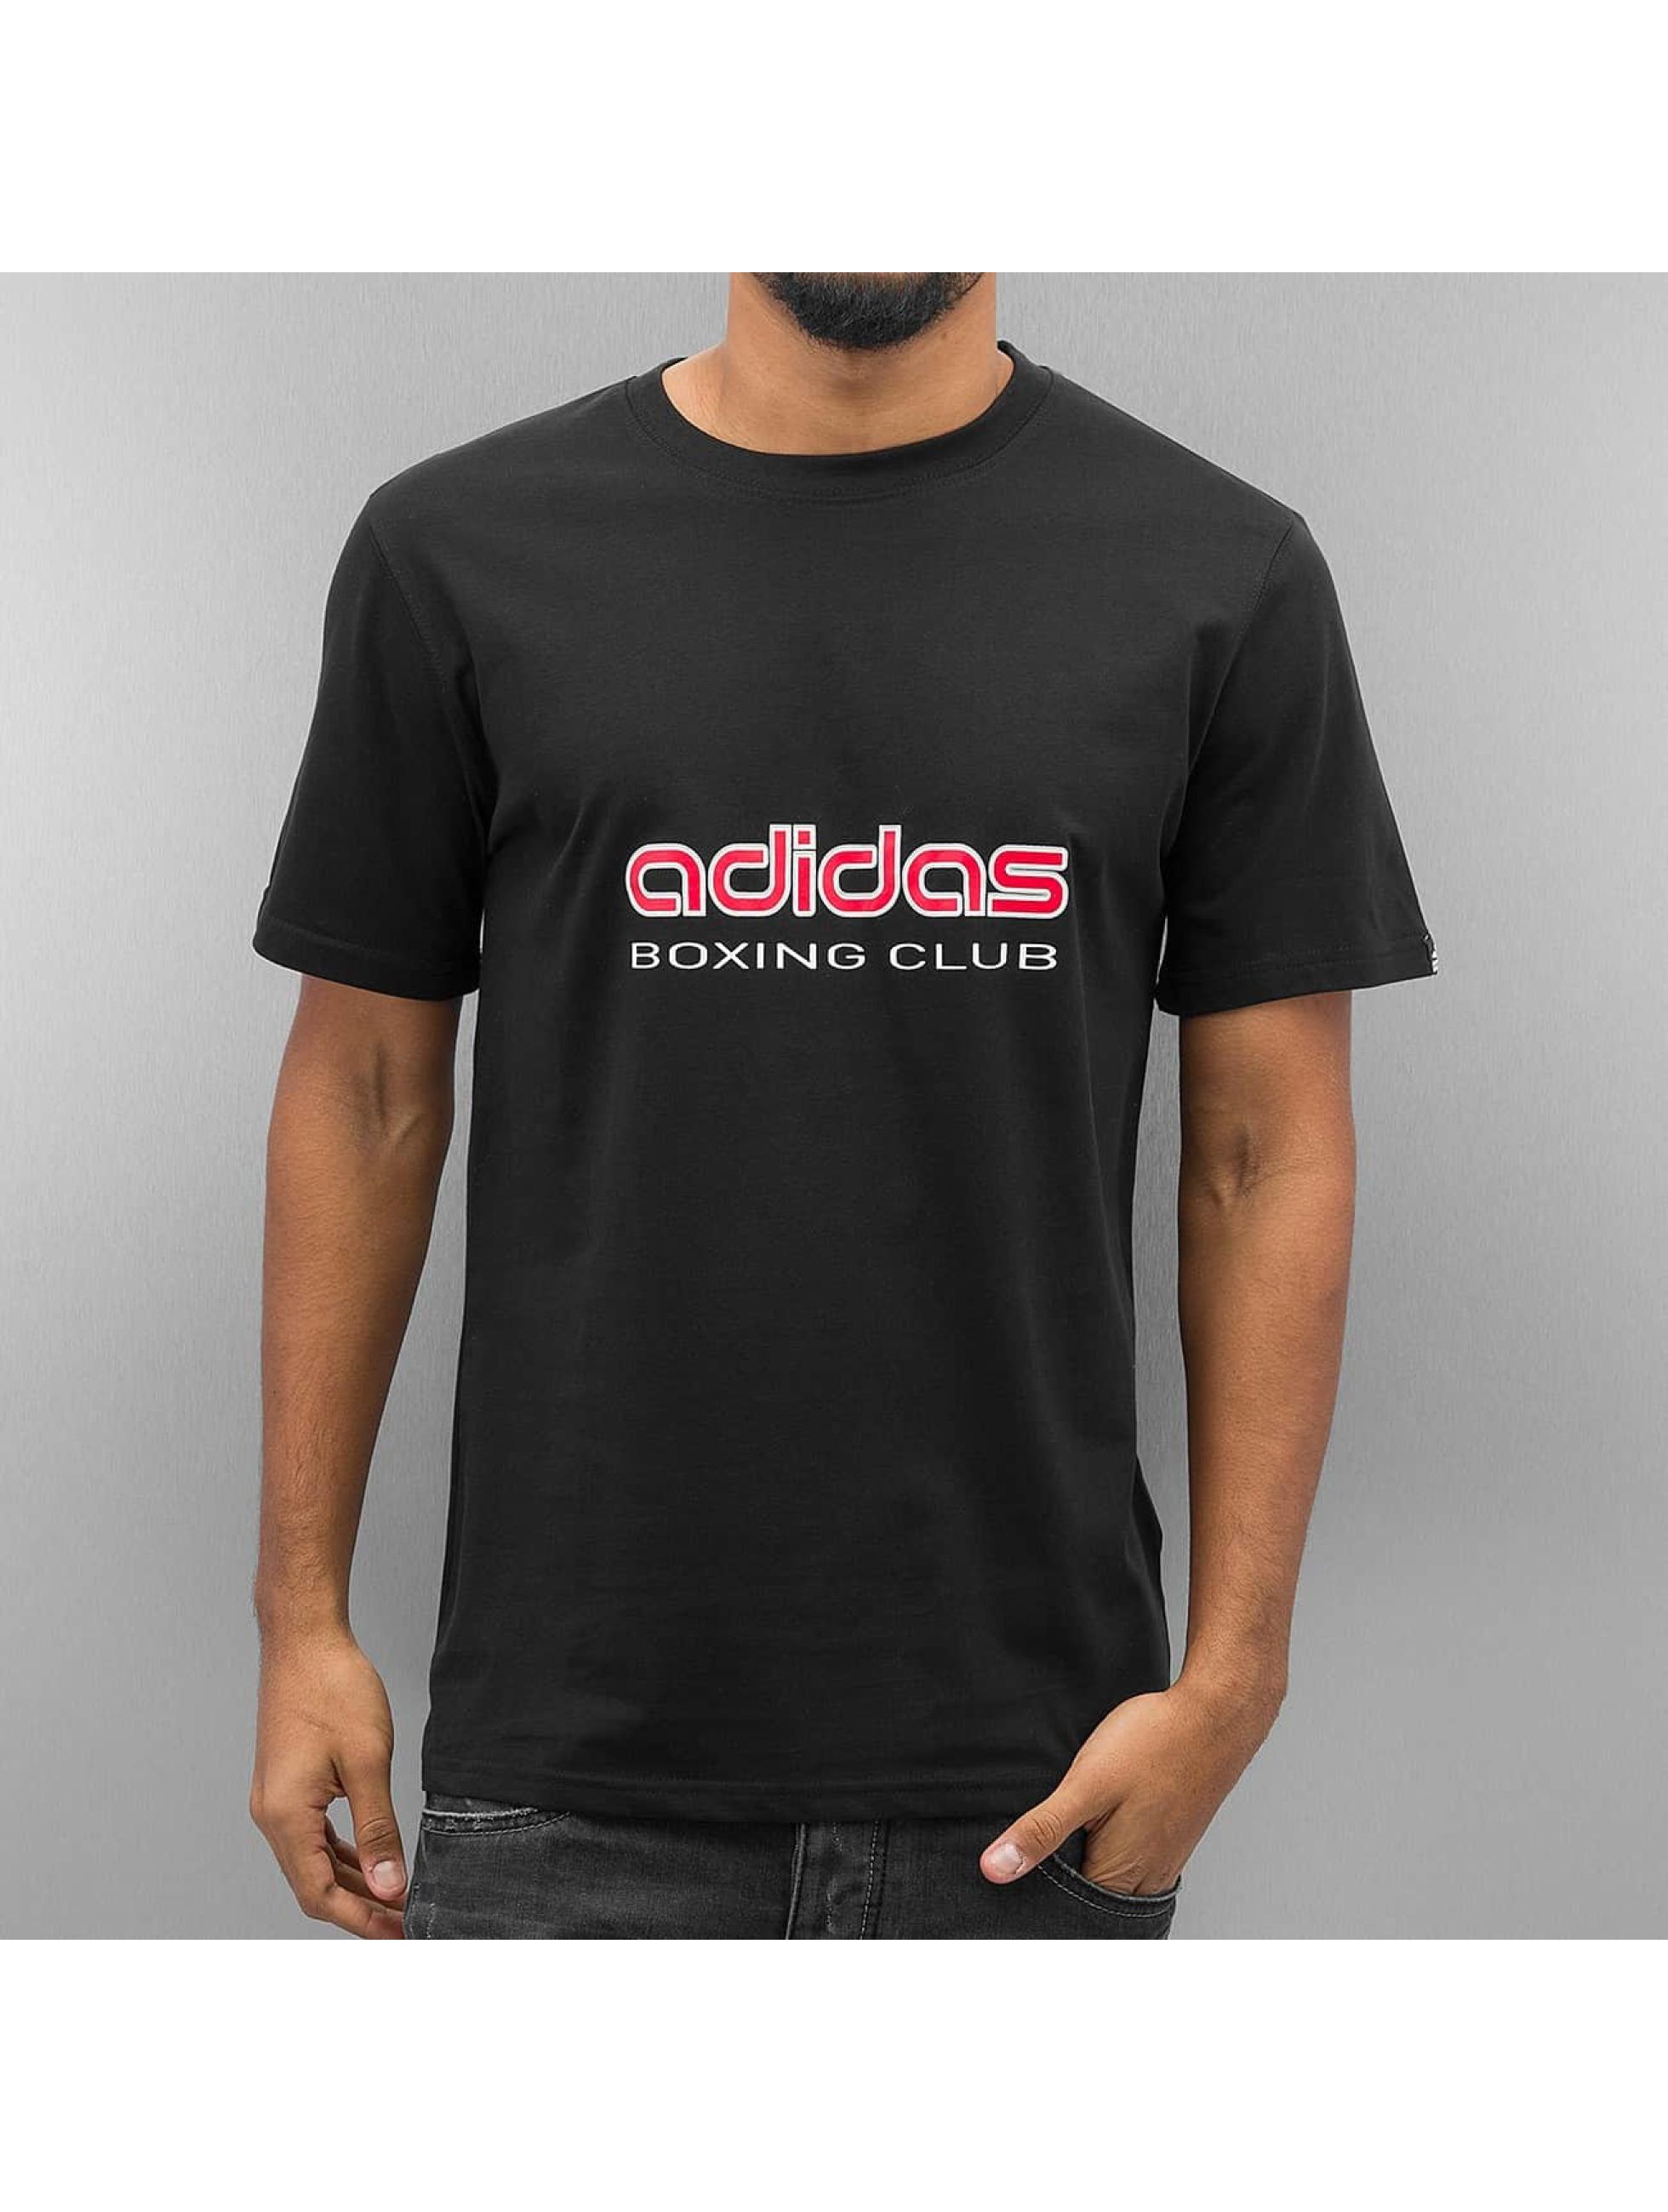 adidas Boxing MMA Männer T-Shirt Boxing Club in schwarz